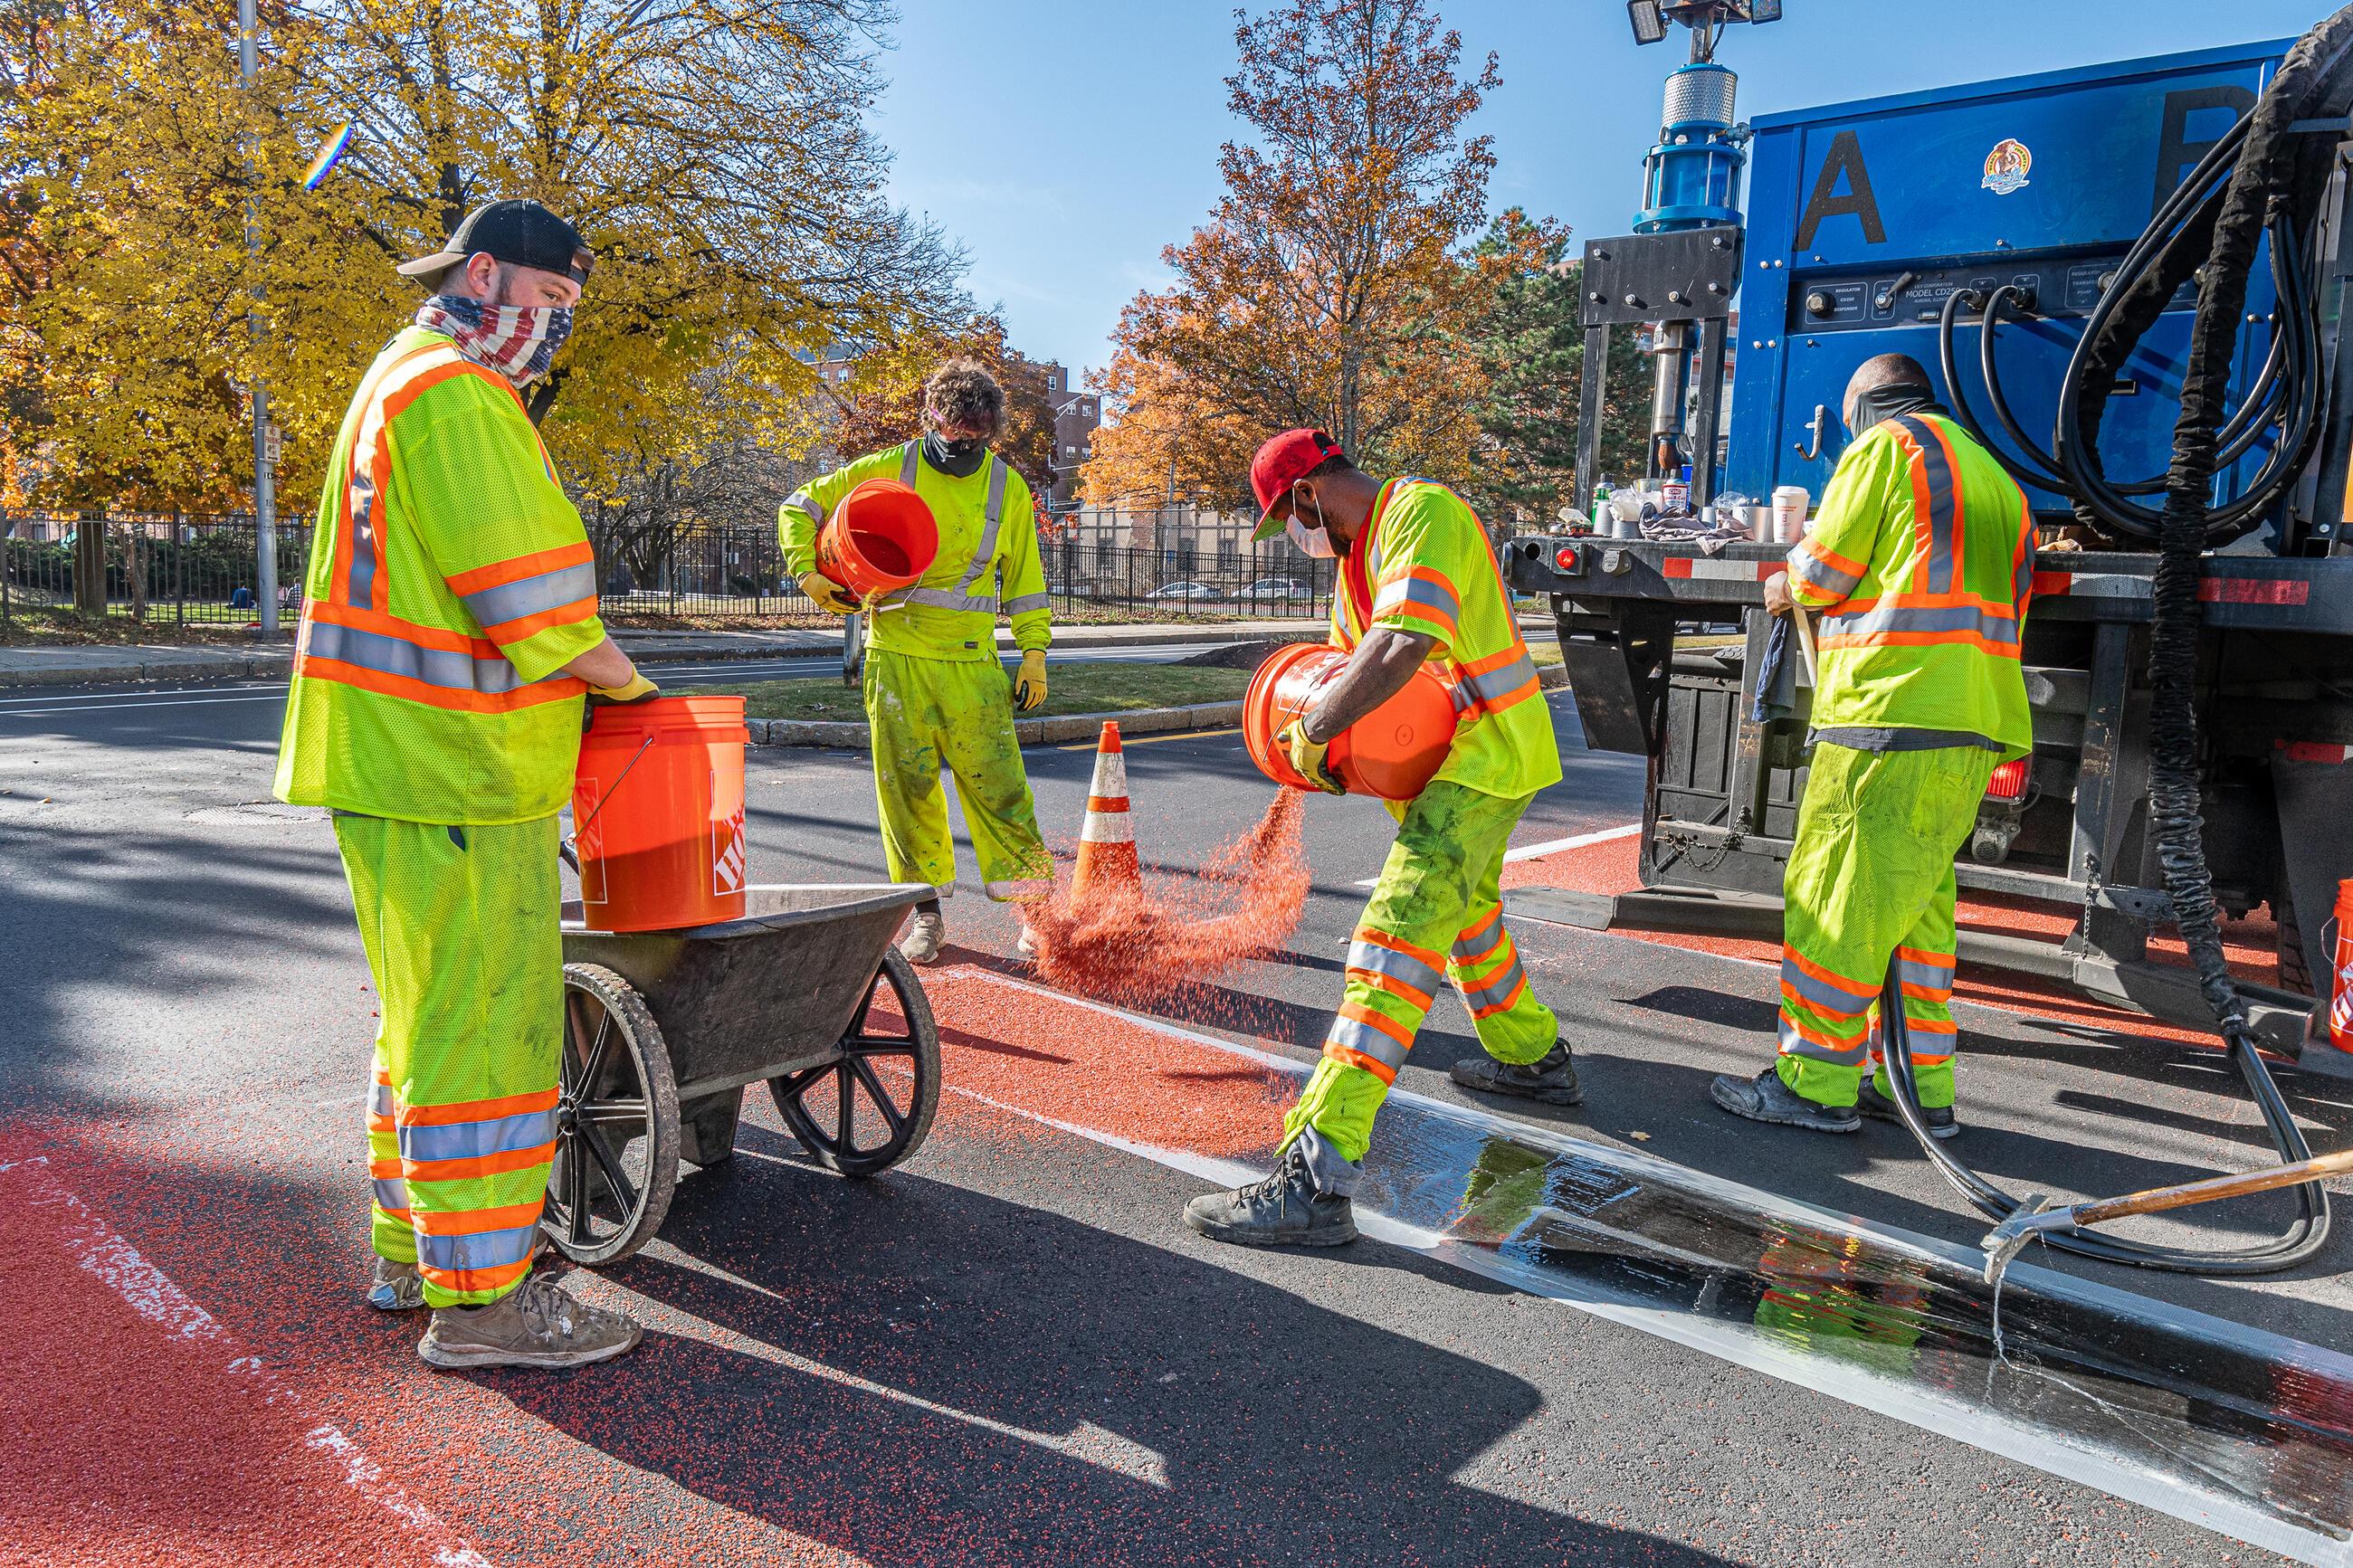 Road crews installing the Florence Street bus lane on November 9, 2020.